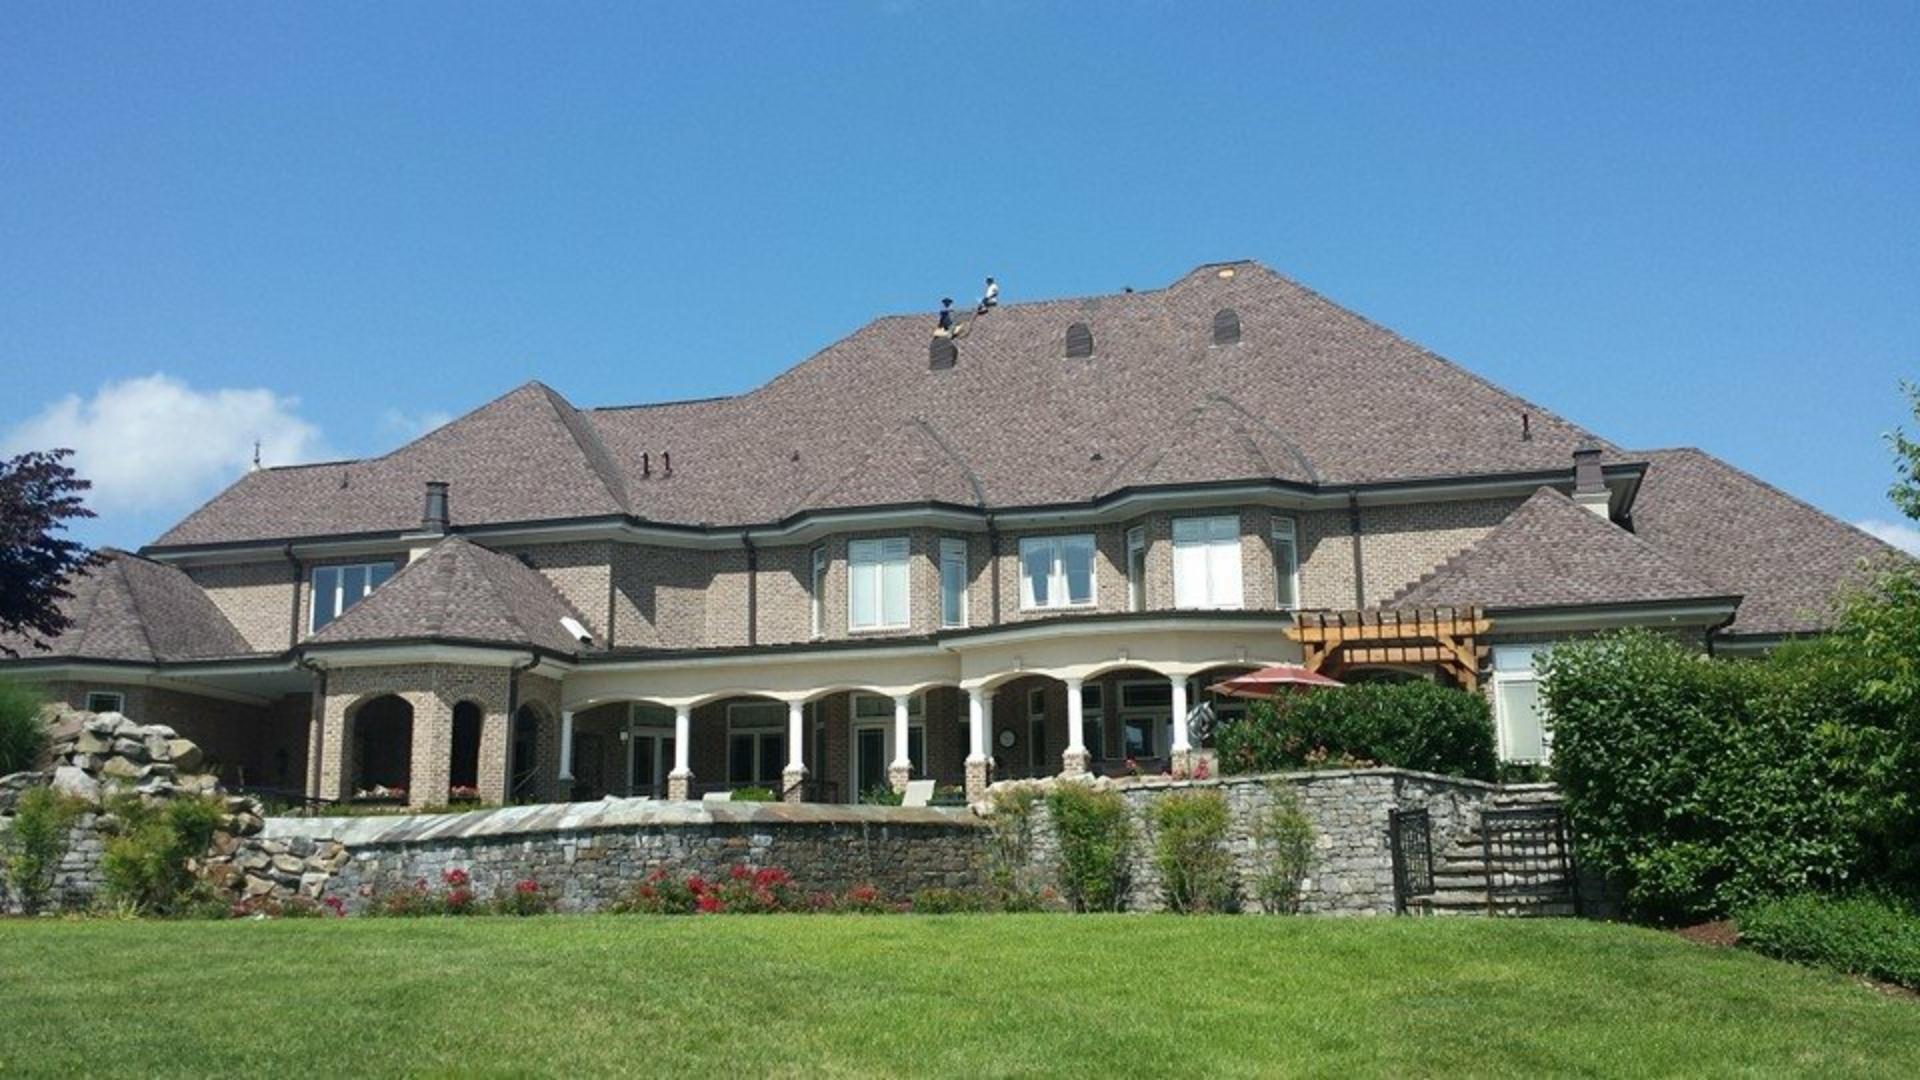 Murfreesboro Roofing Company